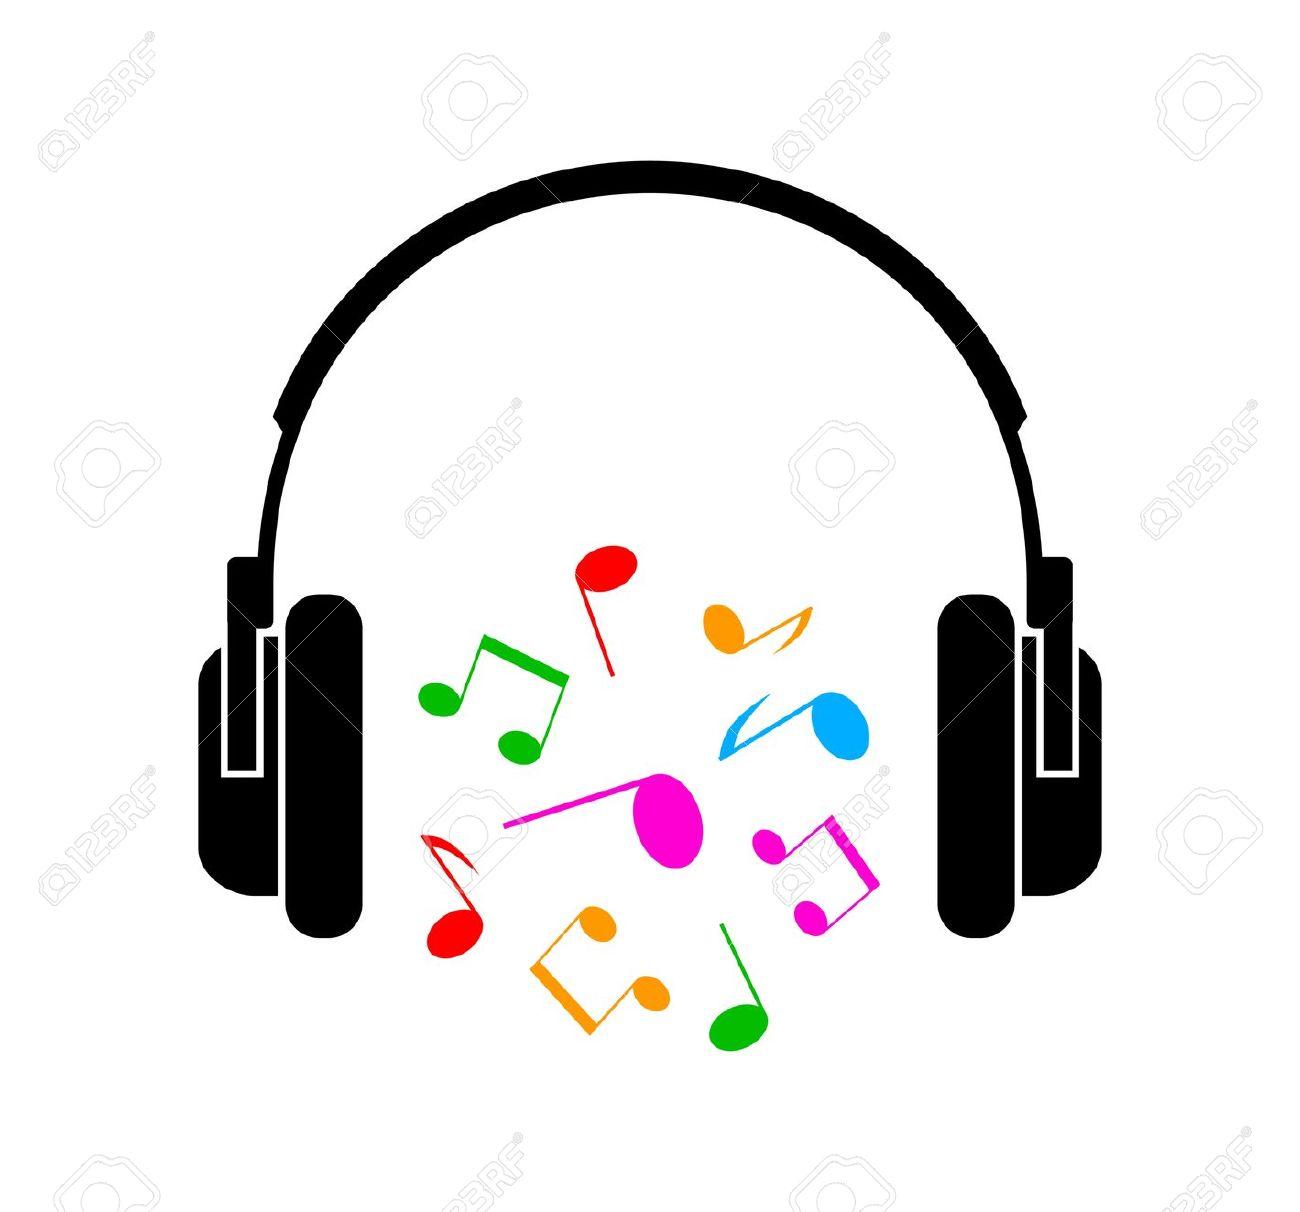 Earbuds clipart headset. Headphones free download best